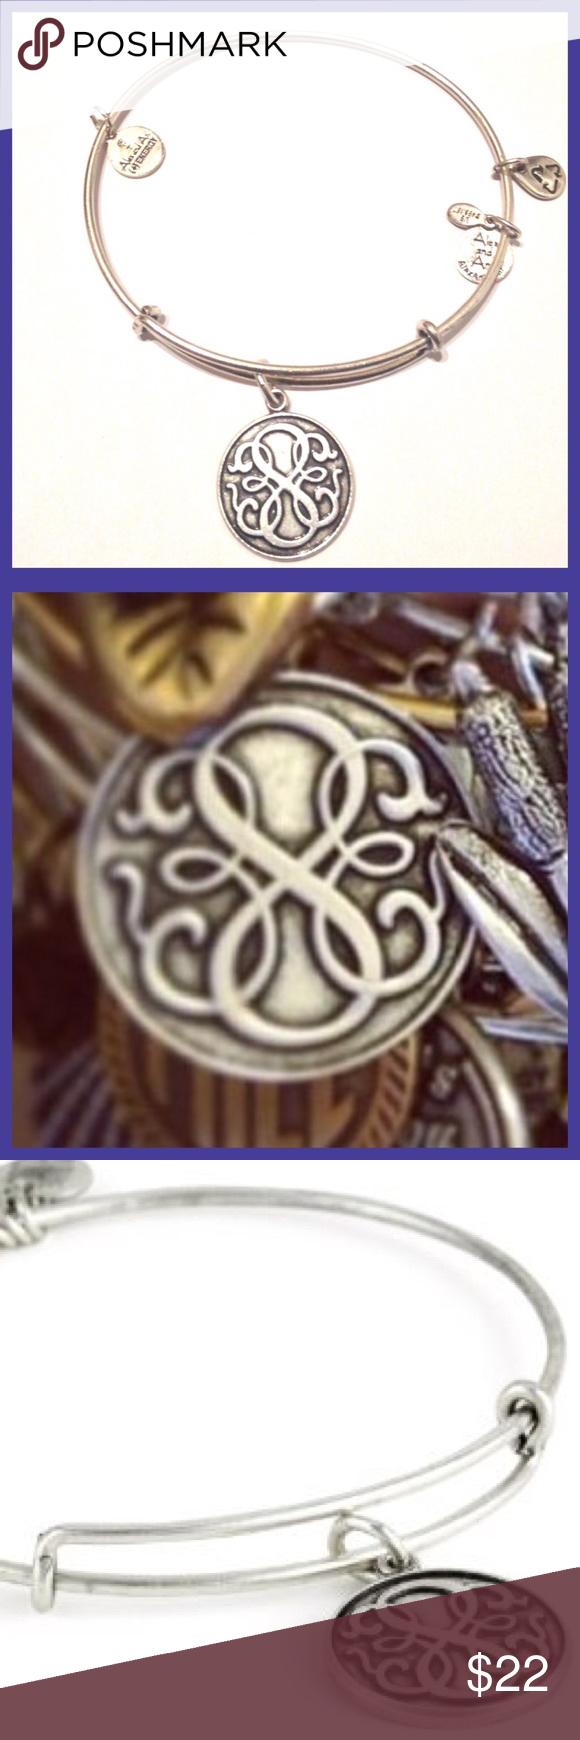 "❤FLASH❤️NWT Alex & Ani expandable Bracelet❤️ NWT Alex & Ani Path of Life expandable Rafaelian Silver Bracelet. The lightweight medallion represents Life's unexpected twists & turns.  6-9"" adjustable inner circumference. 1/4"" width. Alex & Ani Jewelry Bracelets"